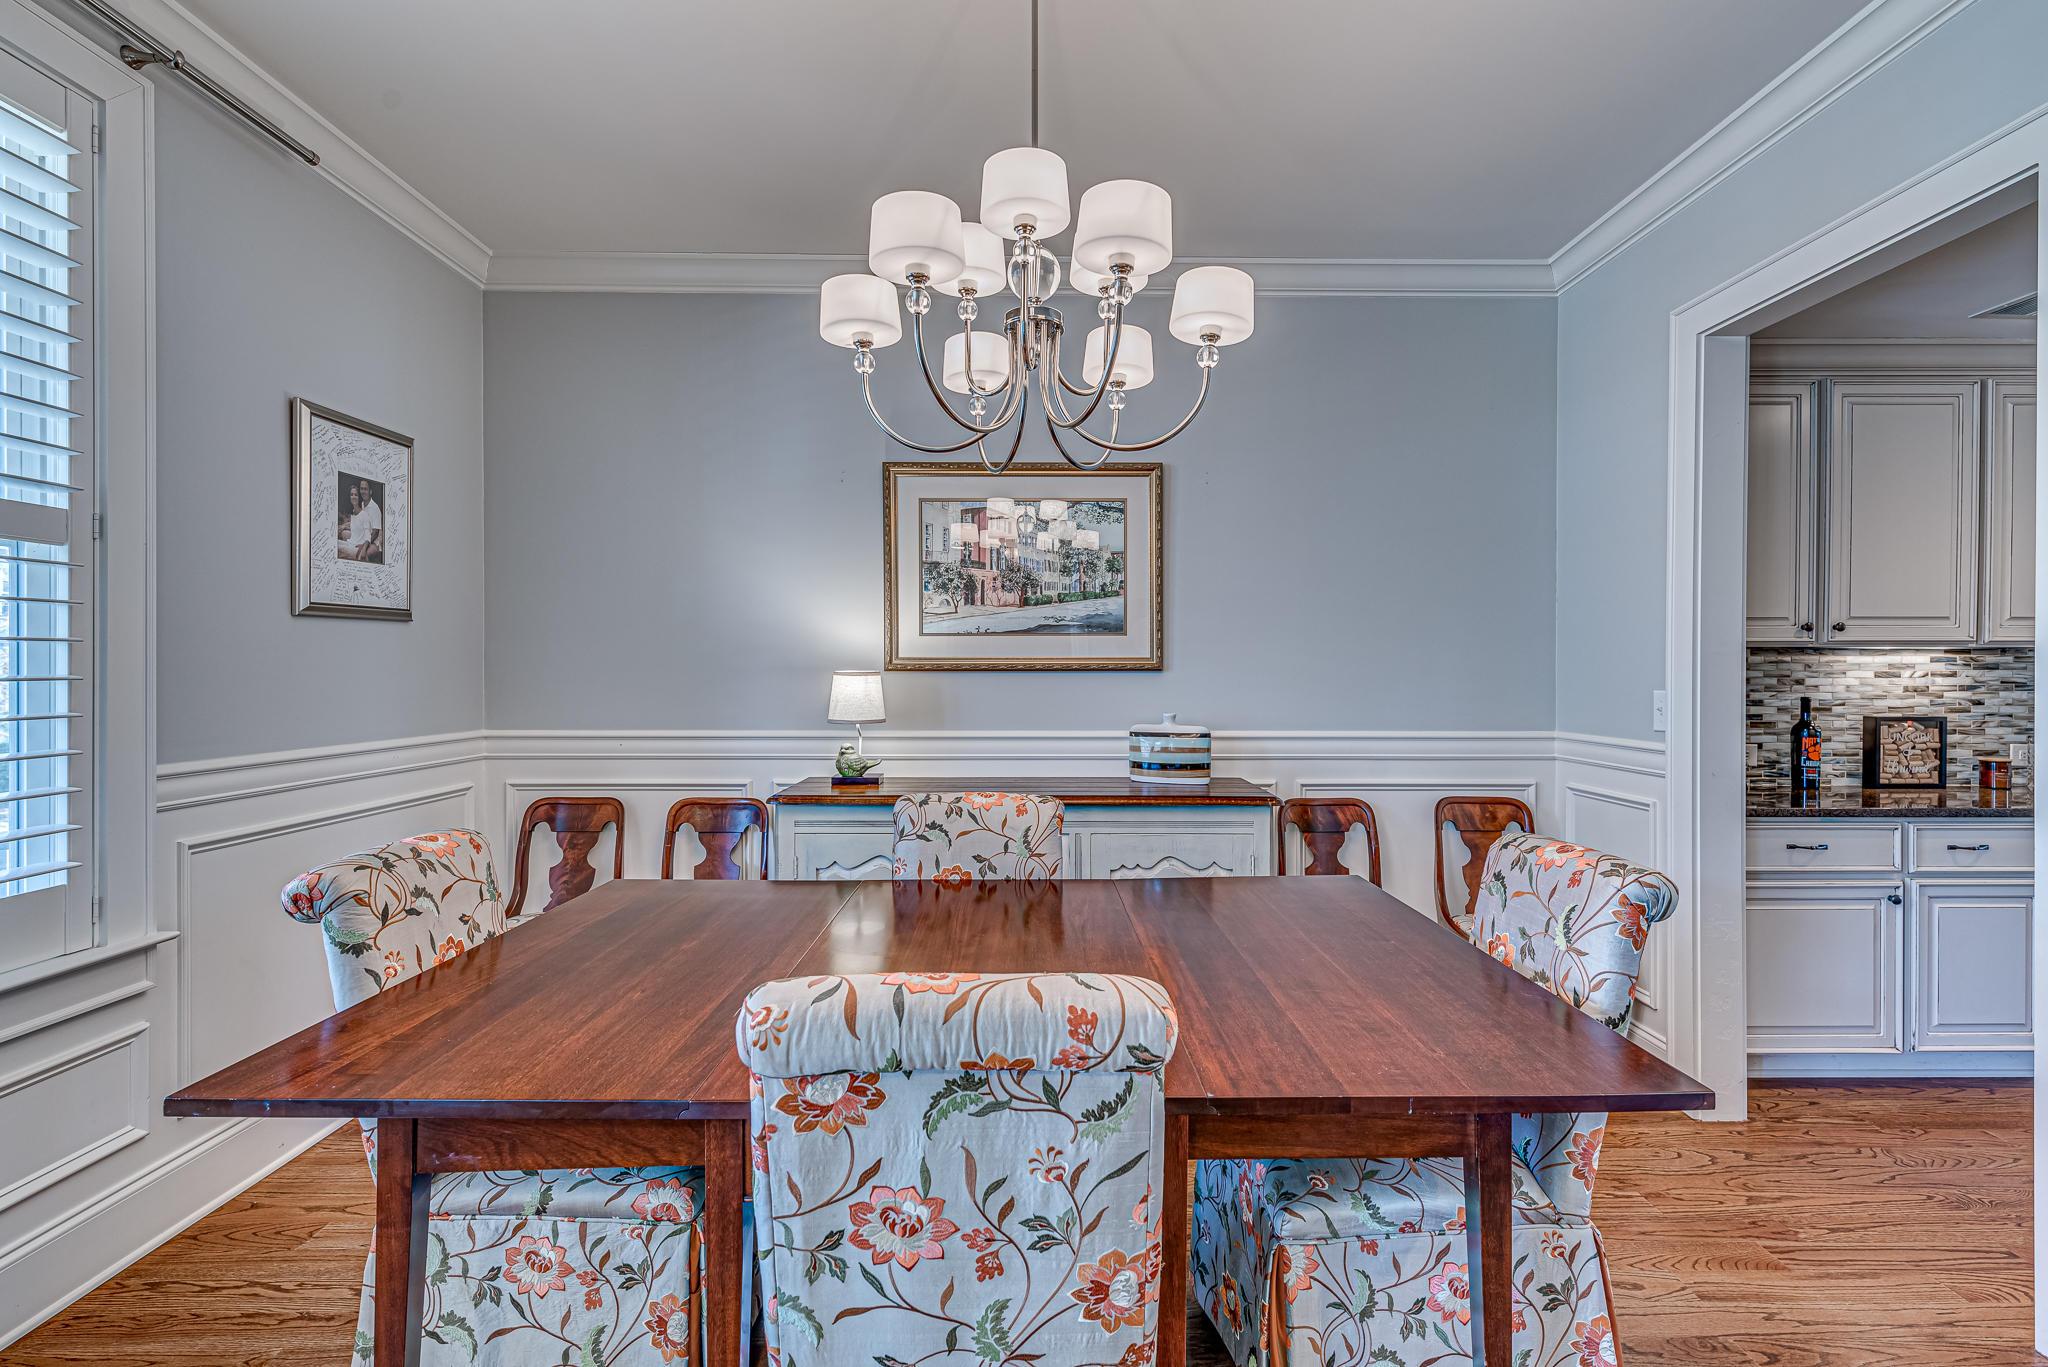 Daniel Island Smythe Park Homes For Sale - 1410 Wando View, Charleston, SC - 0